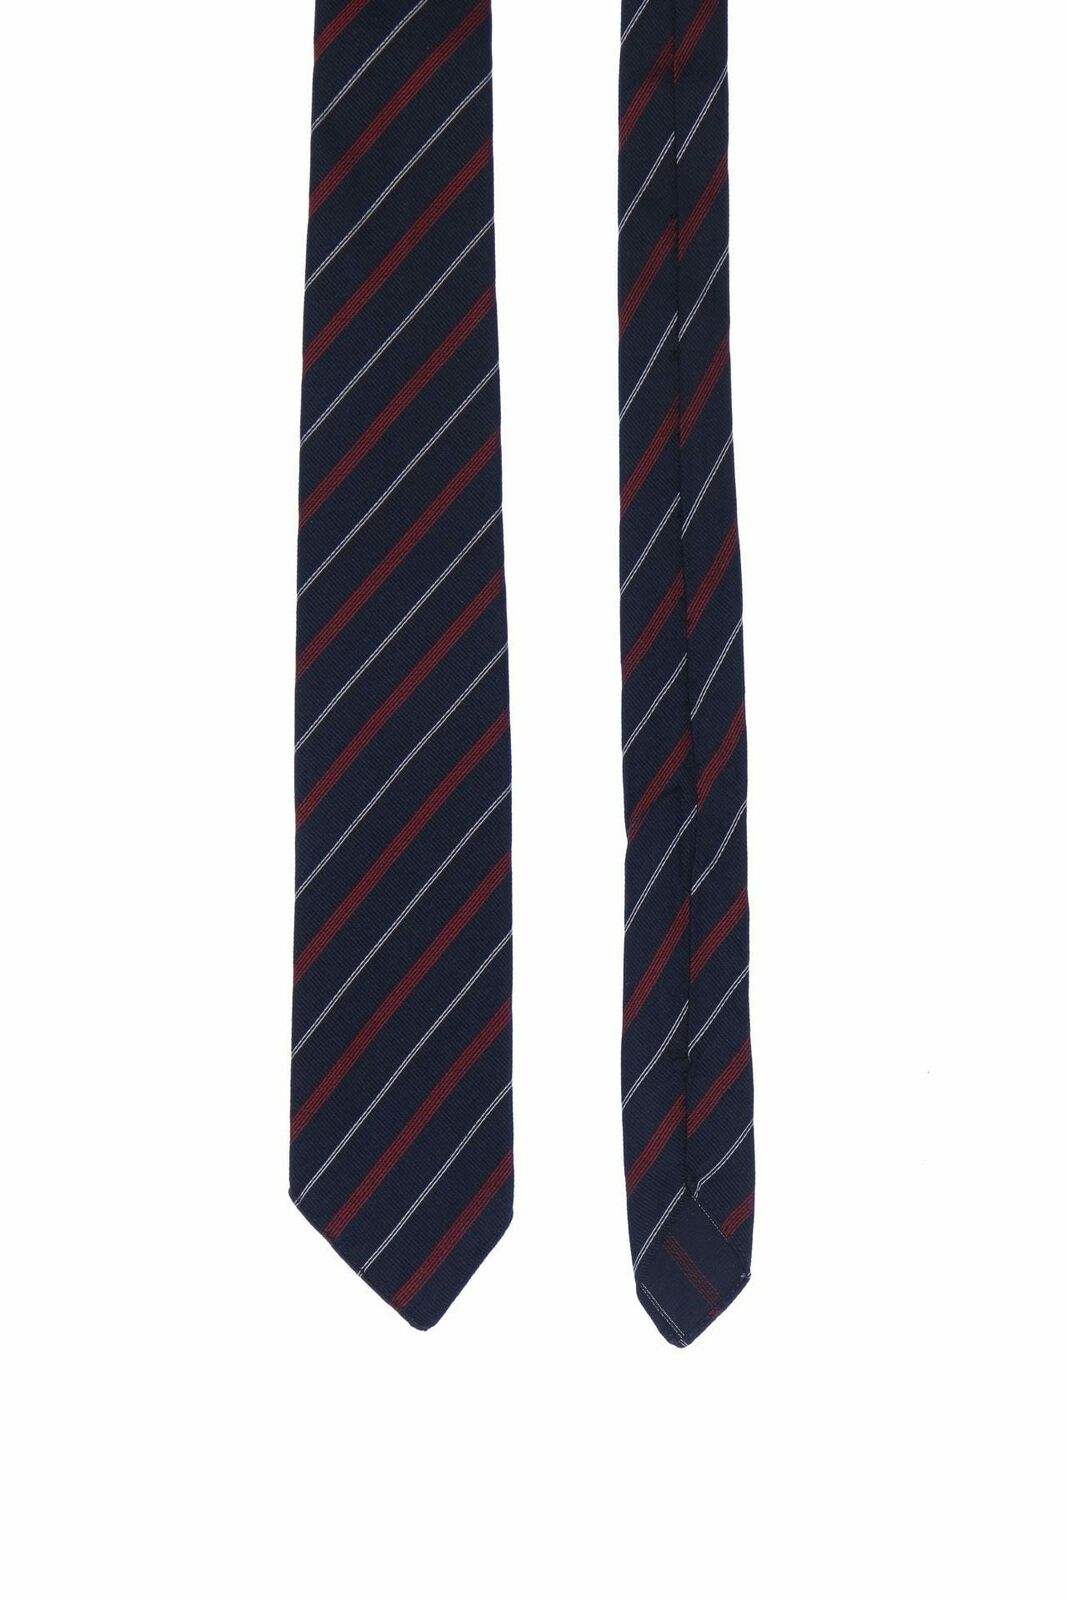 Altea Silk Tie with Stripes Black Silk Tie